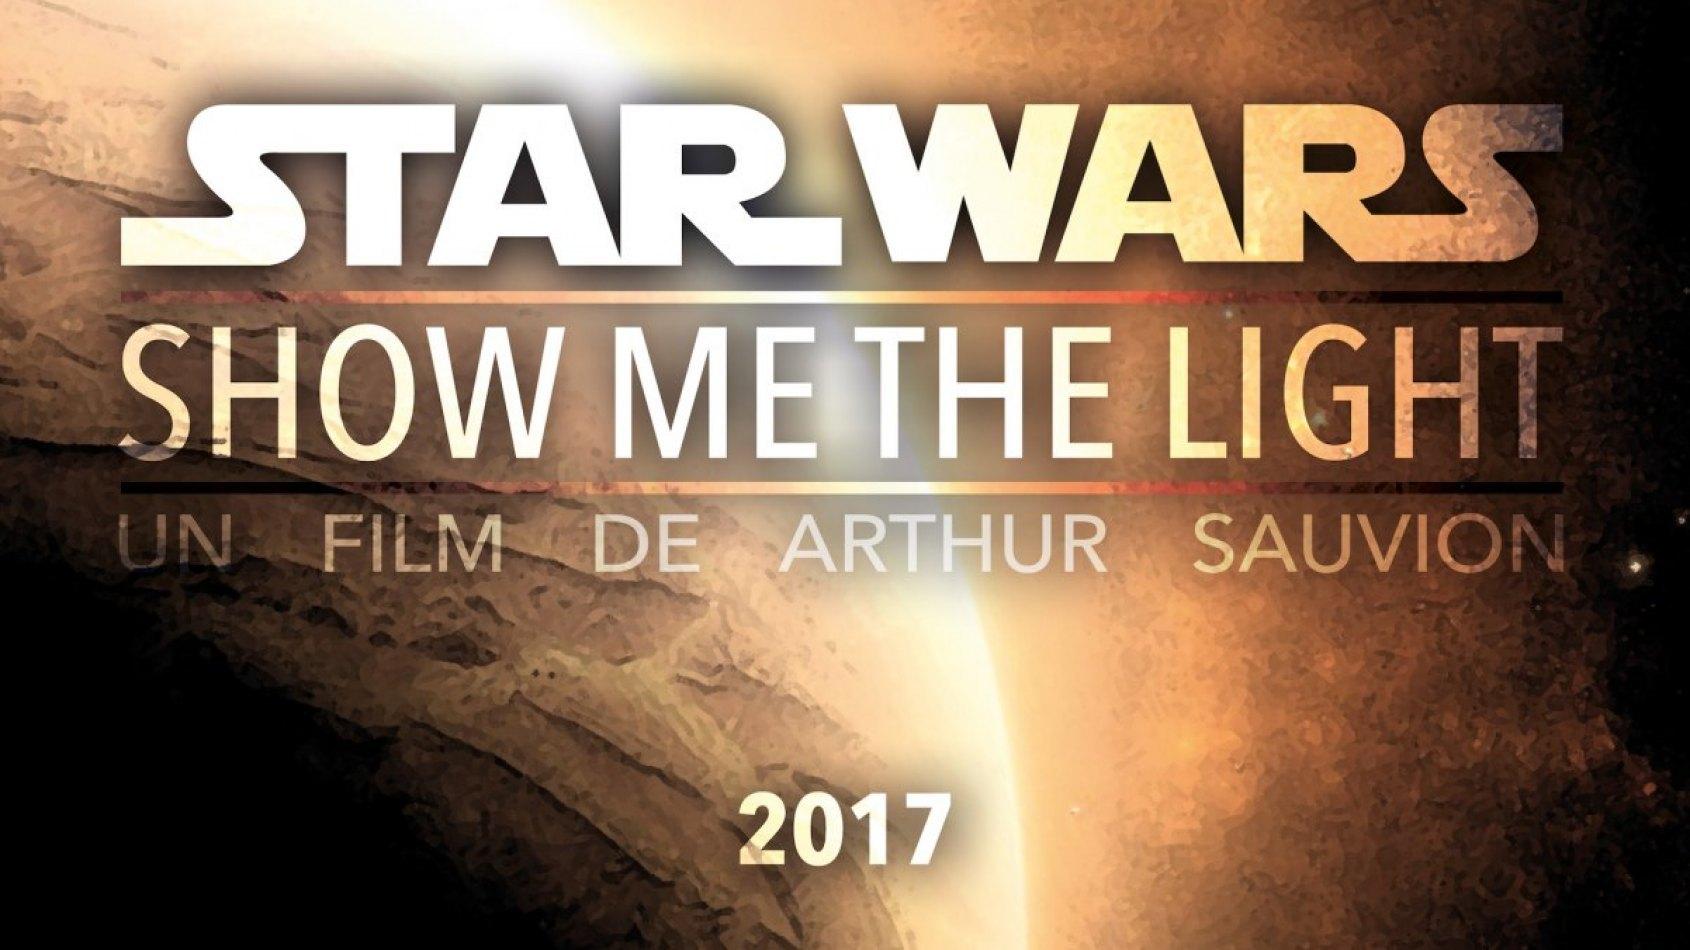 Star Wars - Show Me The Light, un court m�trage avec Plan�te Star Wars